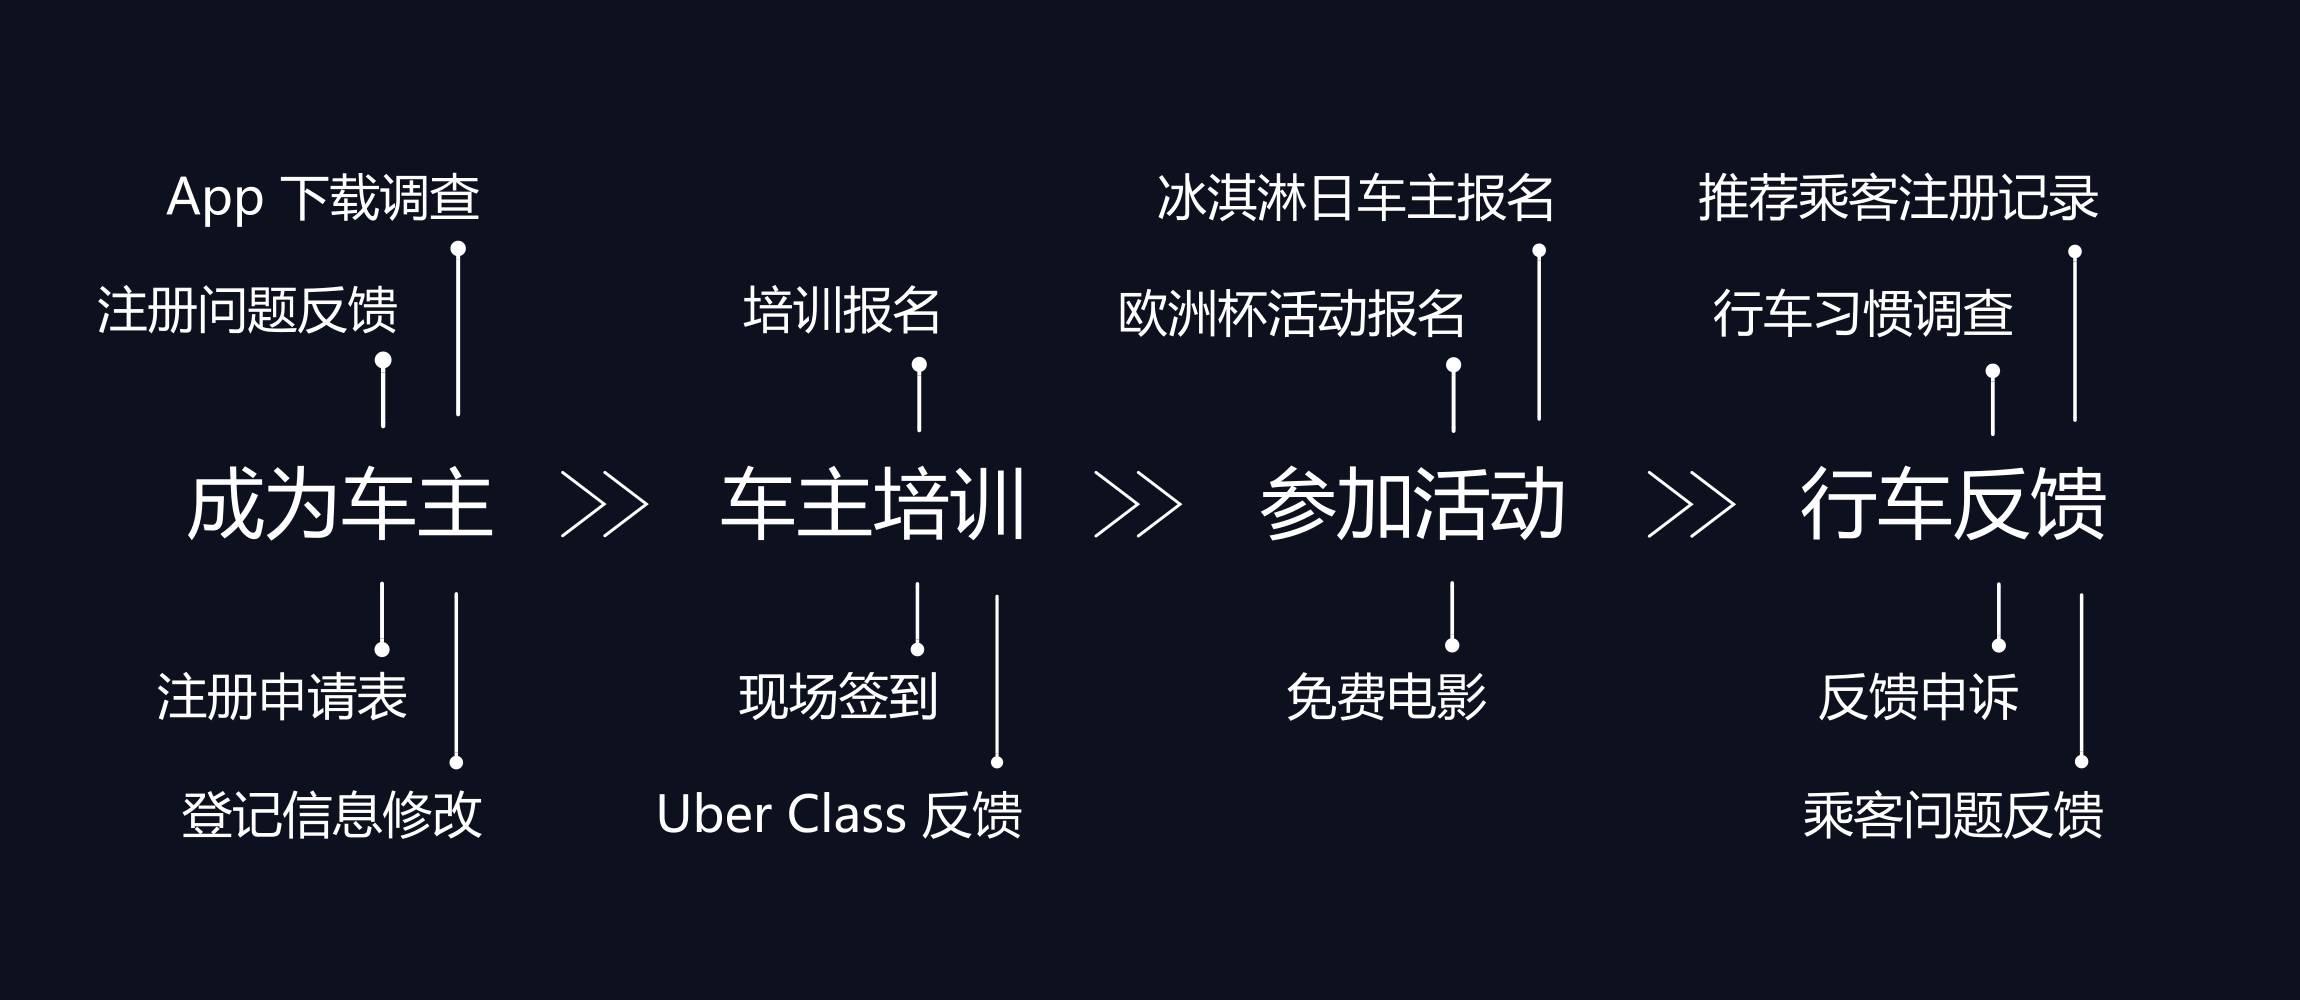 Uber 用上金数据,原来运营可以这么玩?